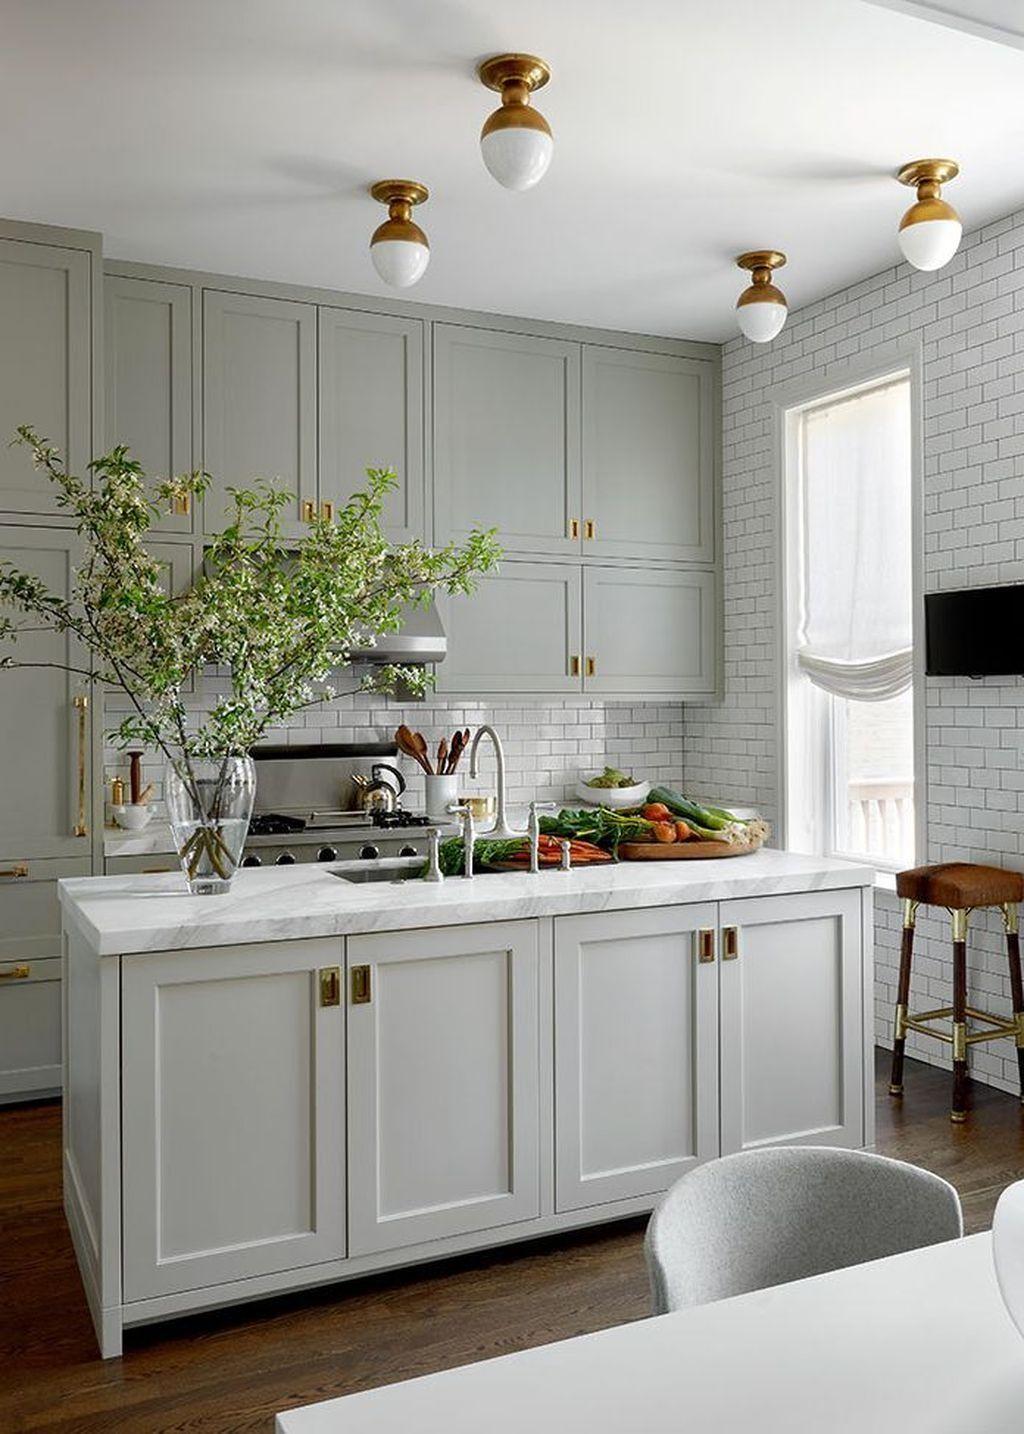 Fabulous Classic Kitchen Design Ideas 20 In 2020 Kitchen Design Small Small Kitchen Decor Kitchen Remodel Small